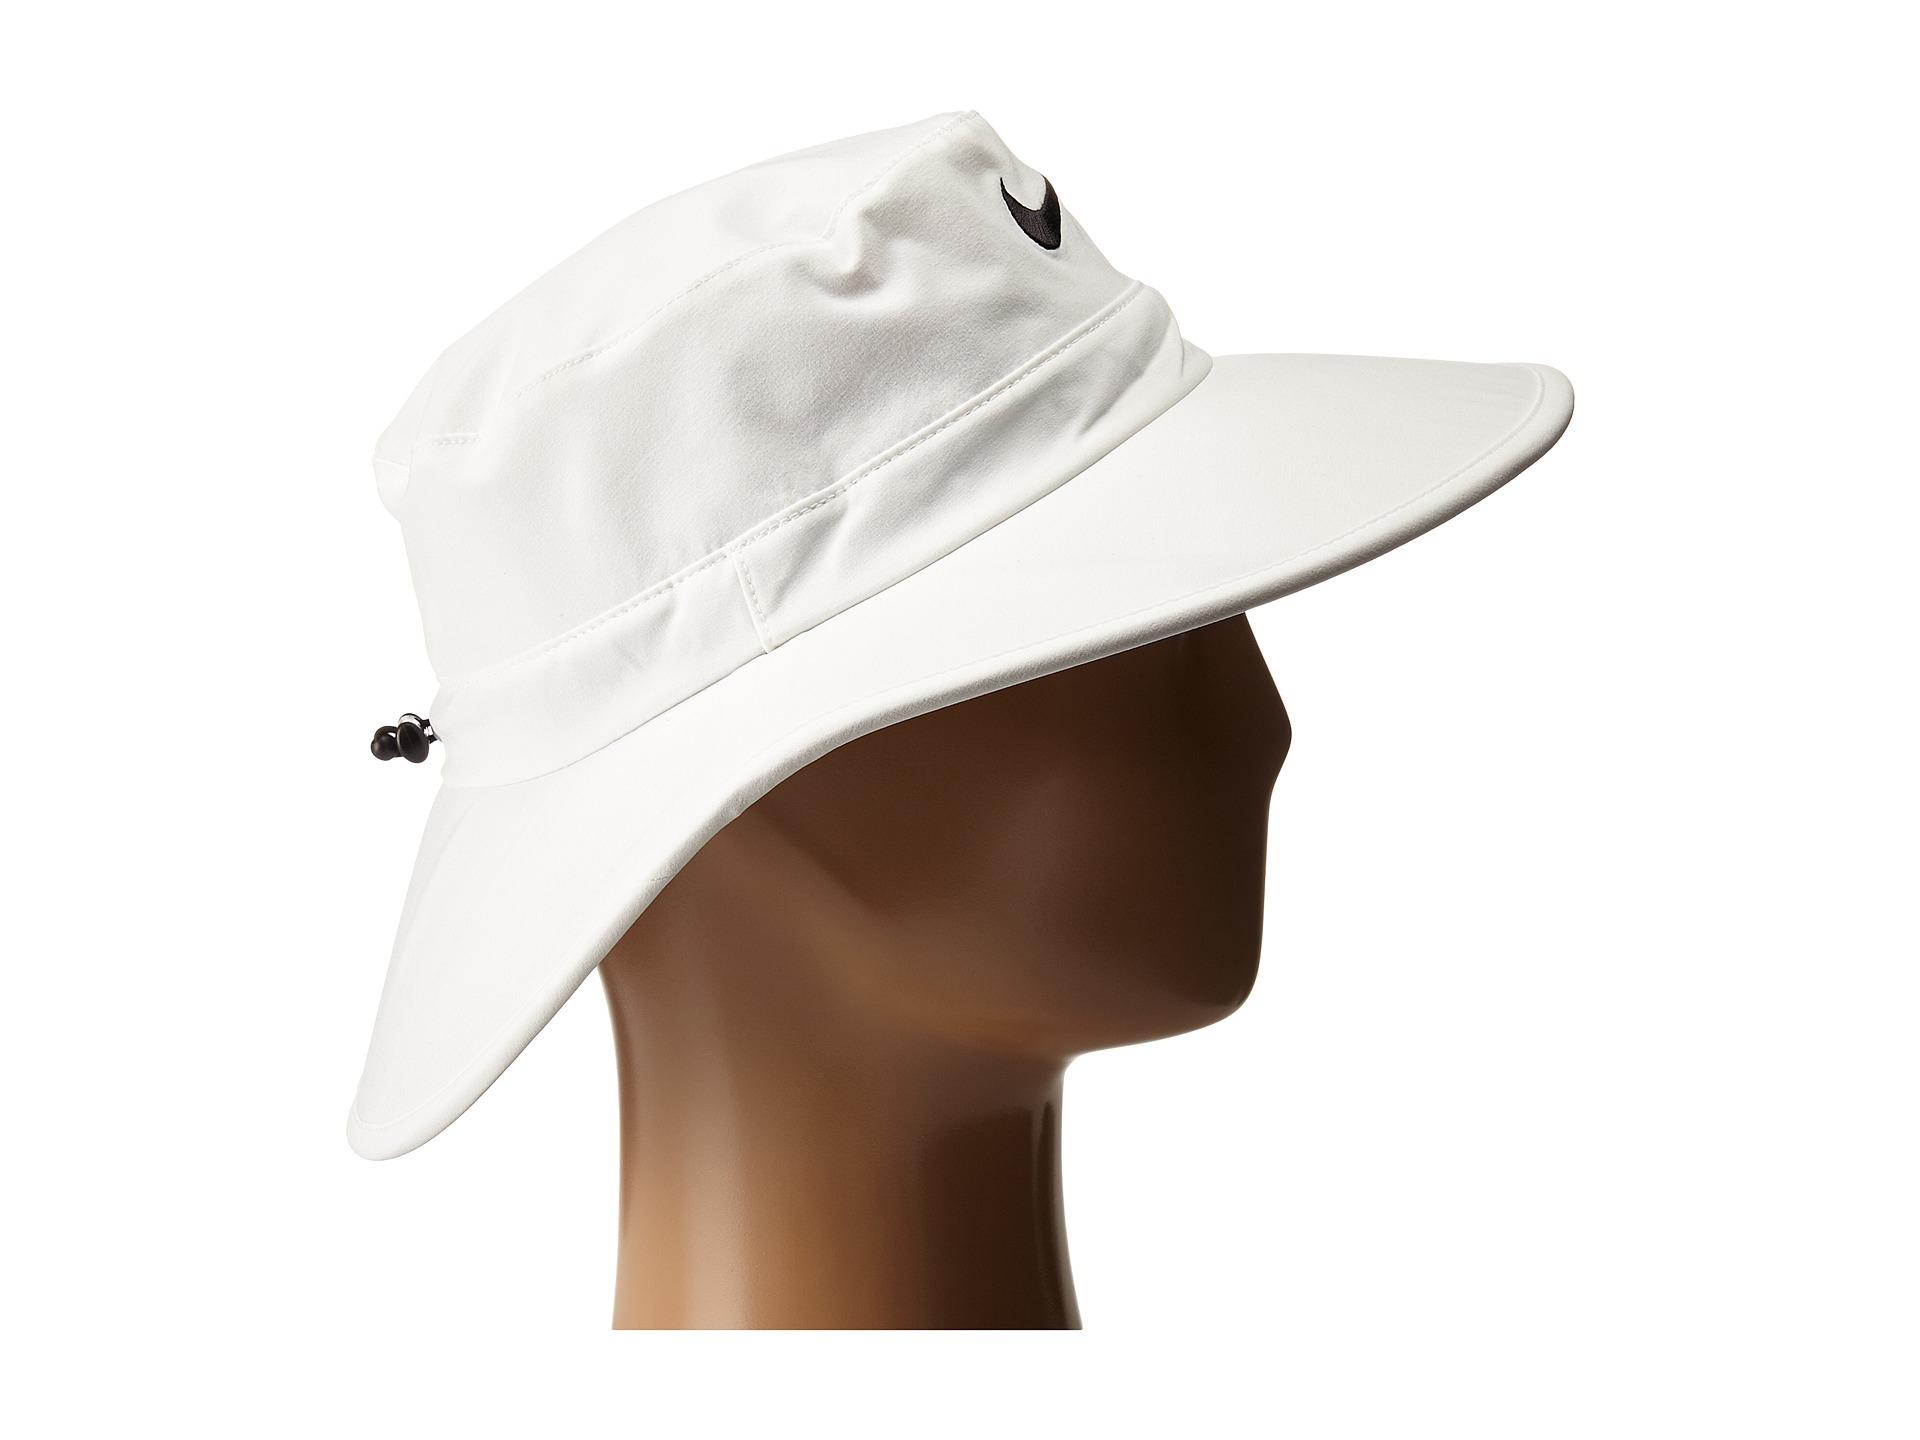 676de2f0 Nike Sun Protect Bucket Cap in White for Men - Lyst